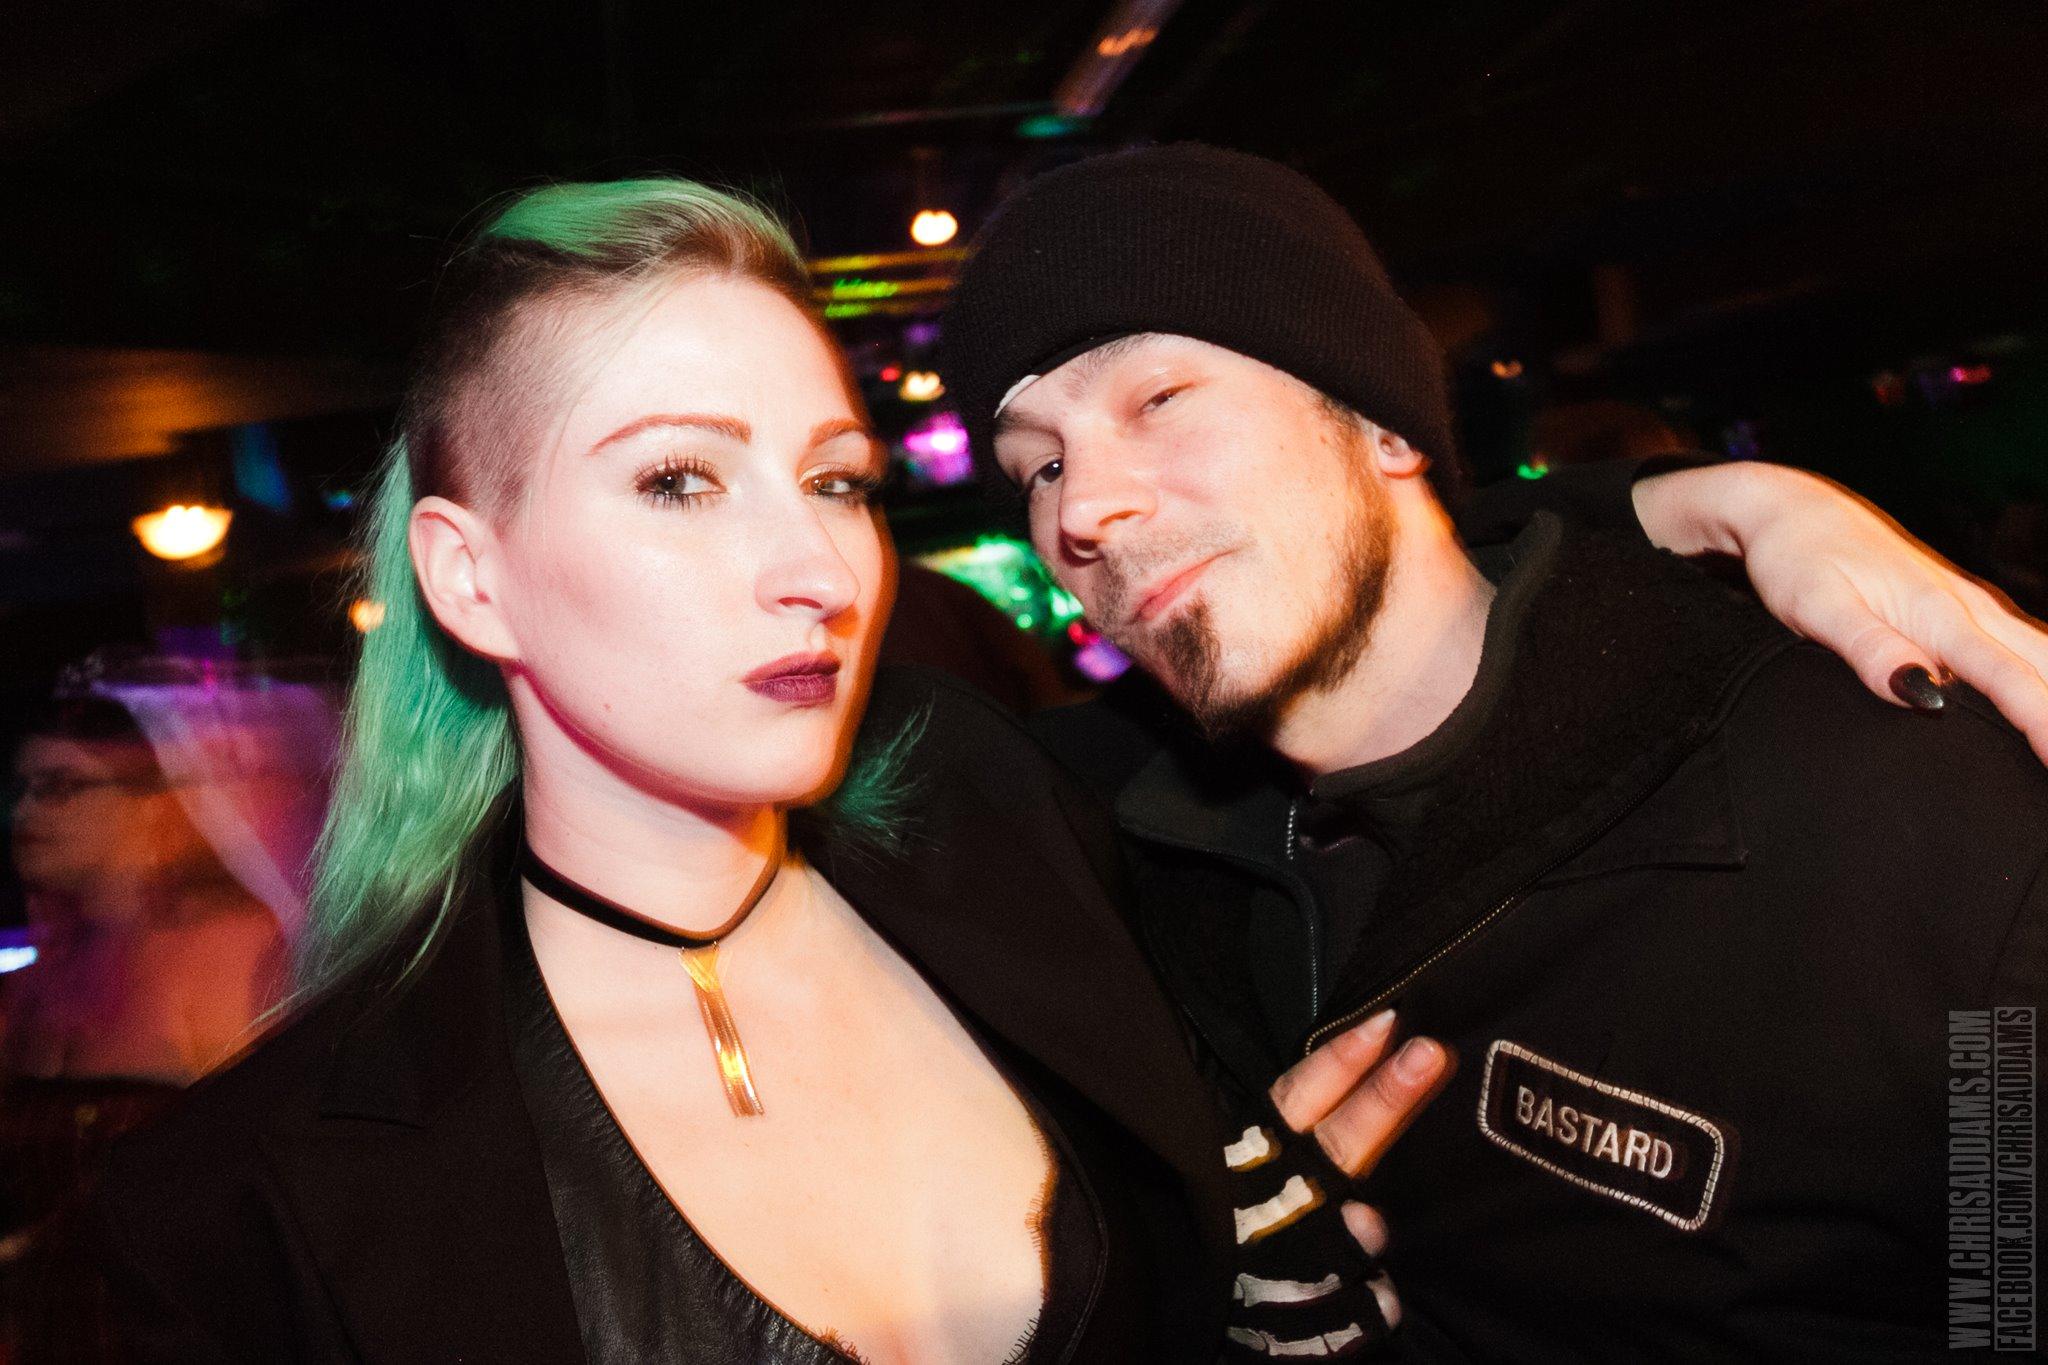 TheHavenClub-Goth-Industrial-Dance-Alternative-Northampton-MA (17).jpg